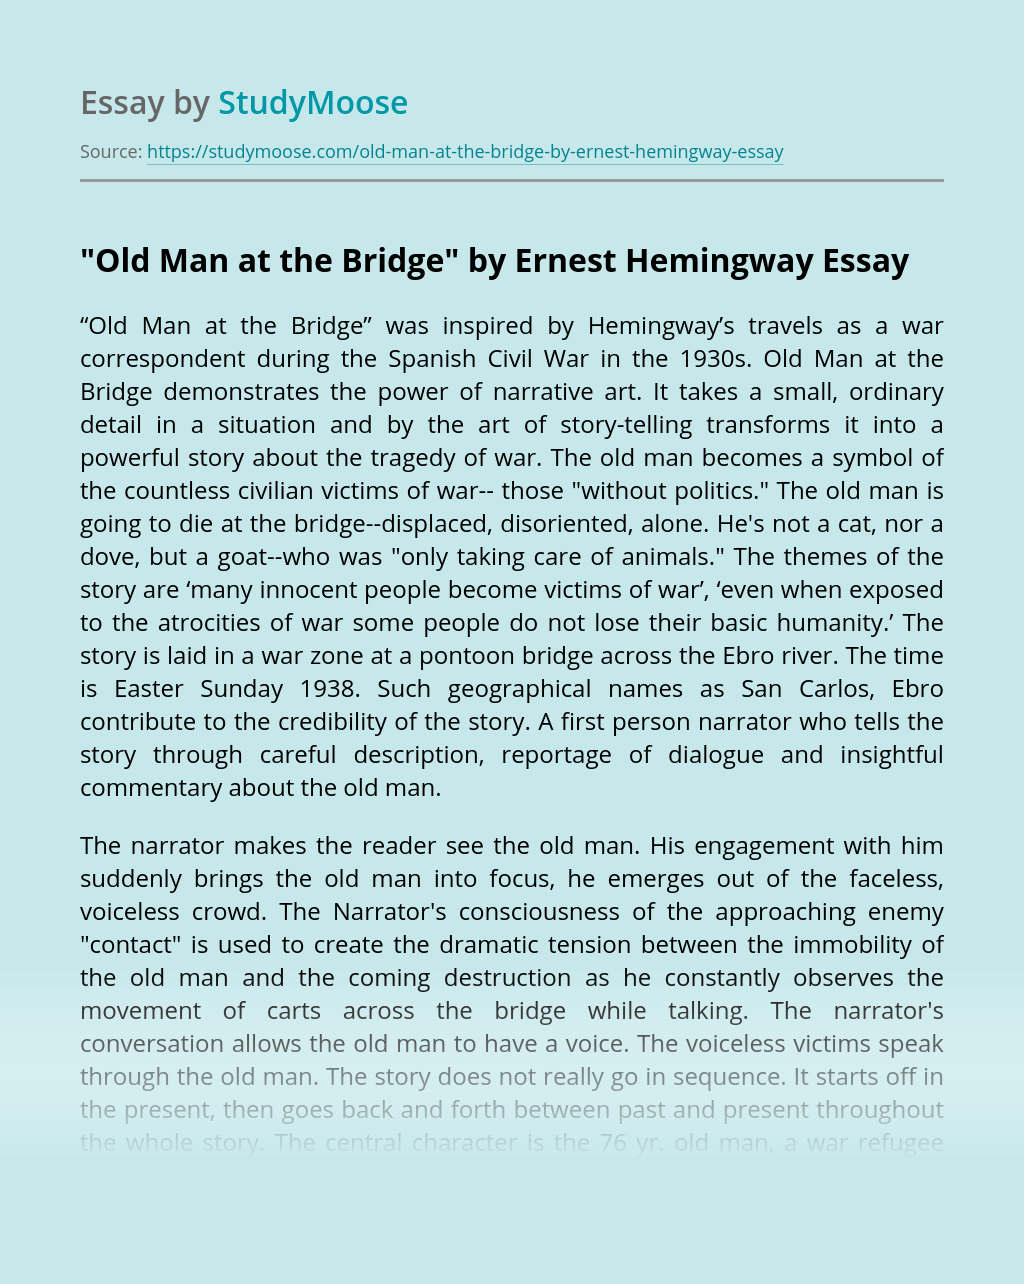 """Old Man at the Bridge"" by Ernest Hemingway"